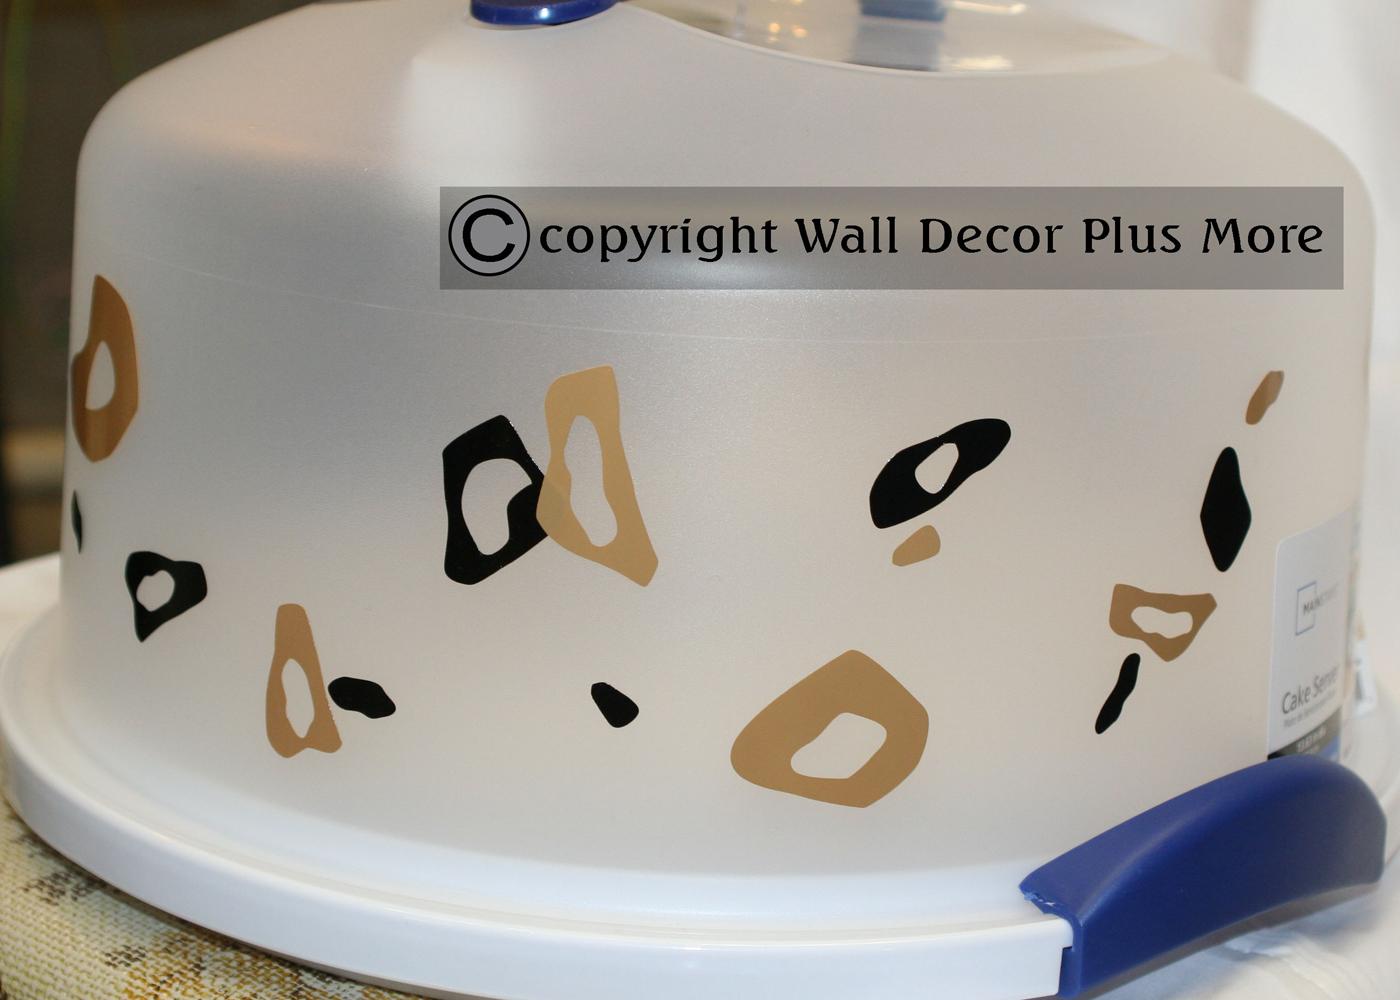 leopard-tiny-vinyl-circles-glossy-on-cake-server.jpg